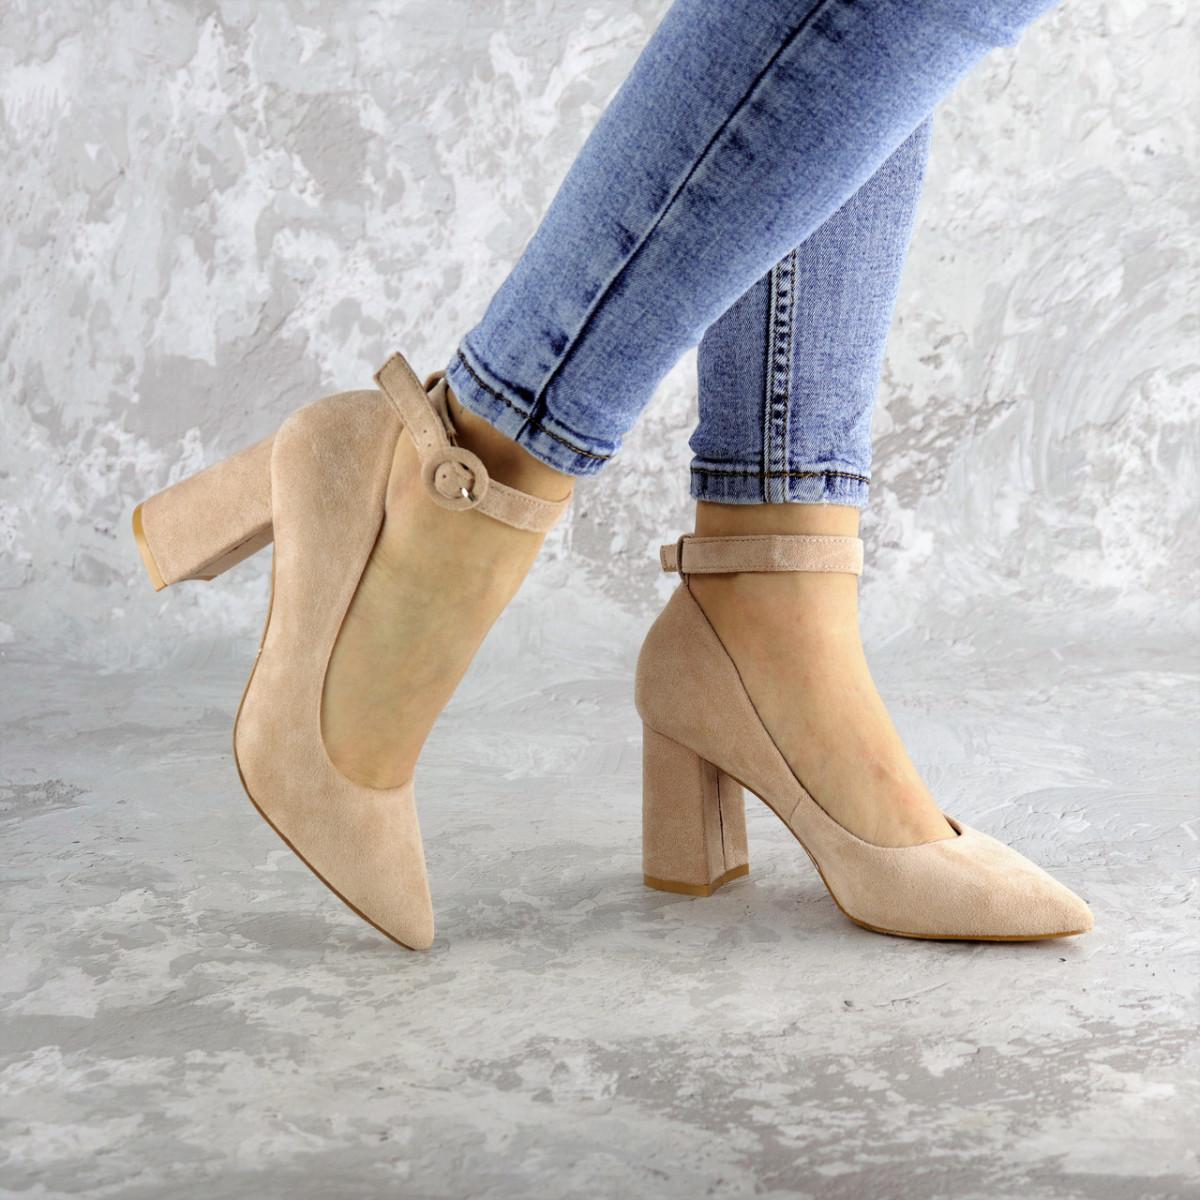 Туфли женские Fashion Winsor 2455 40 размер 25,5 см Бежевый